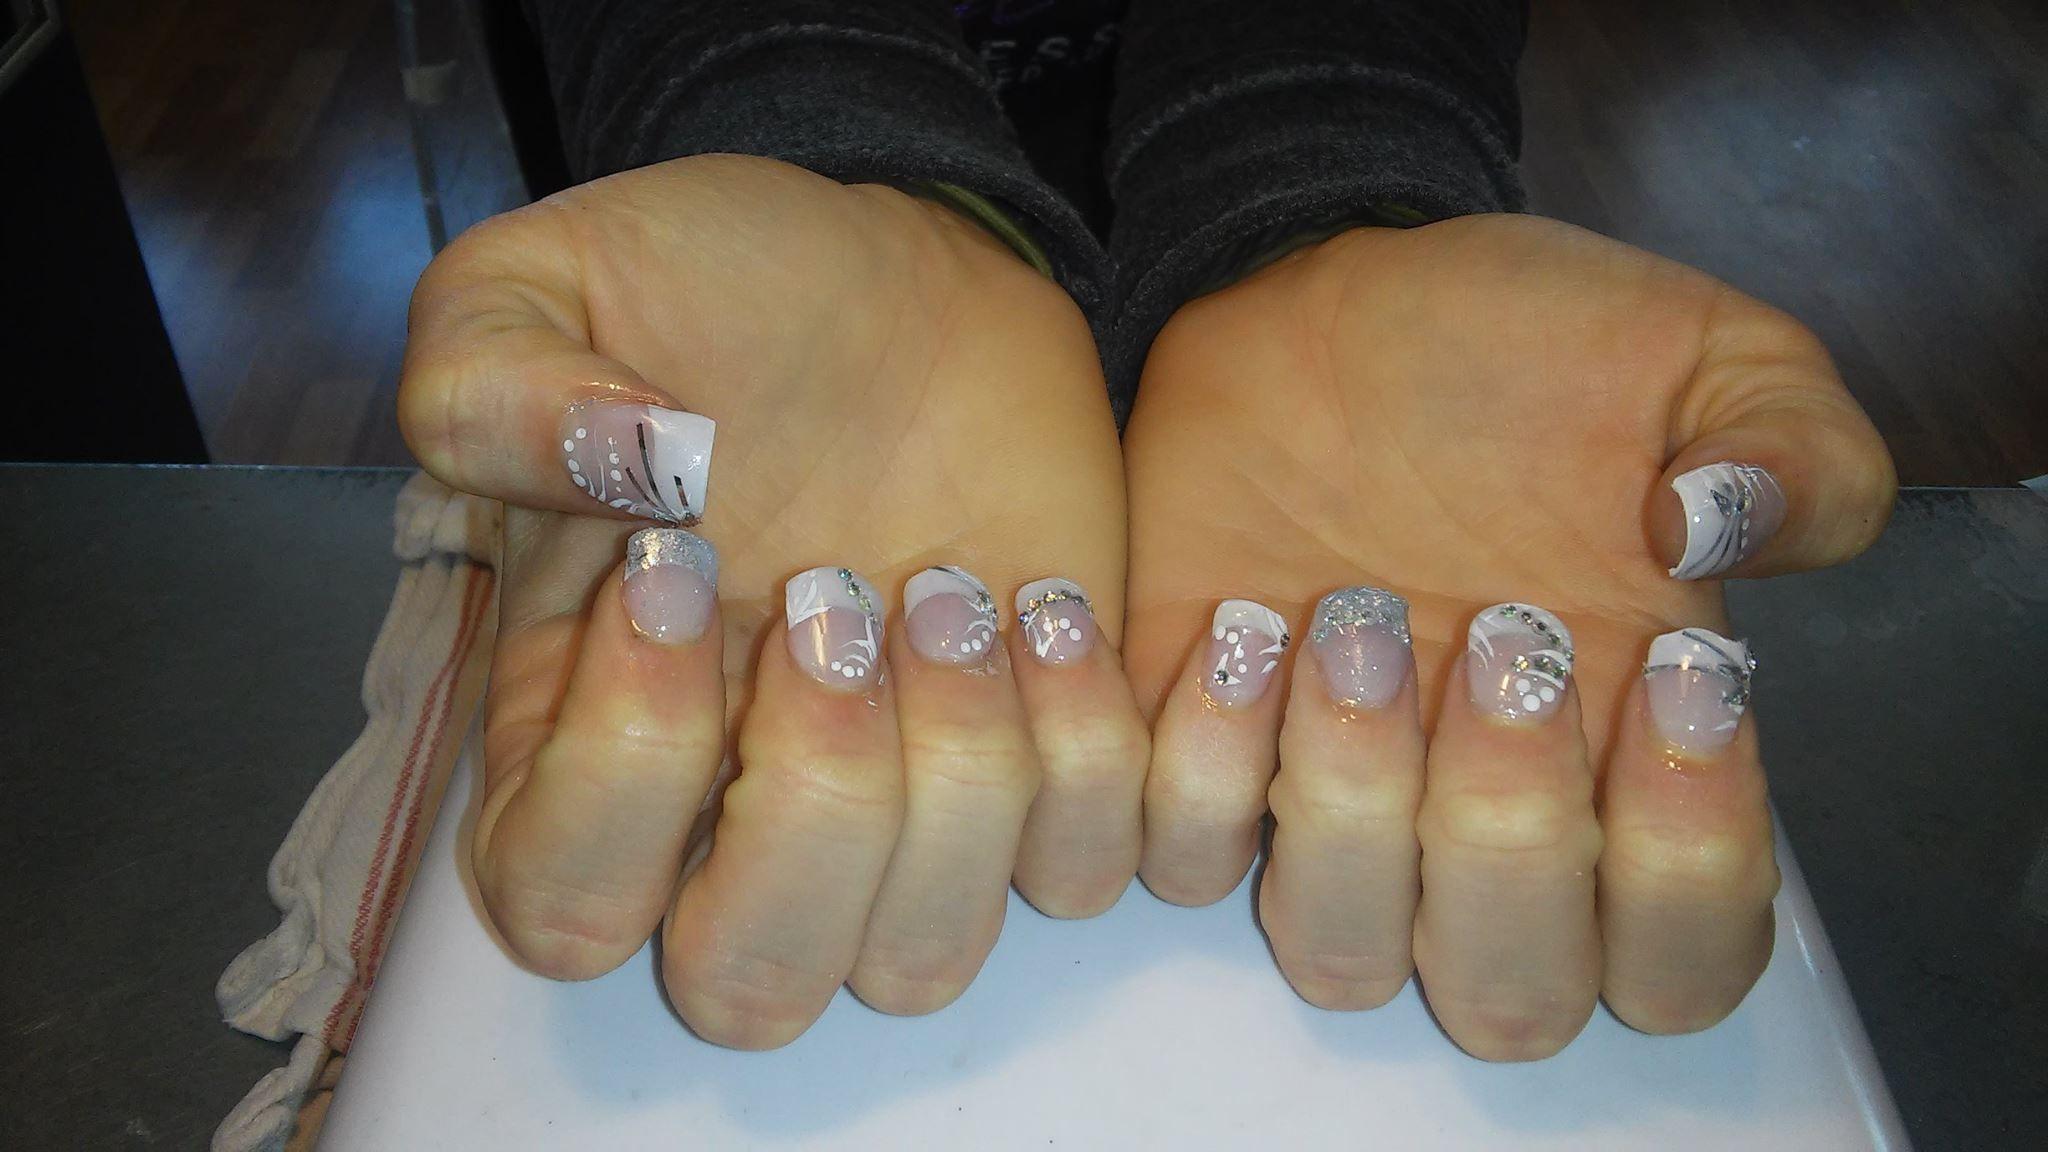 Pin by Camila Swensen on Nails Art | Blush nails, Gradient